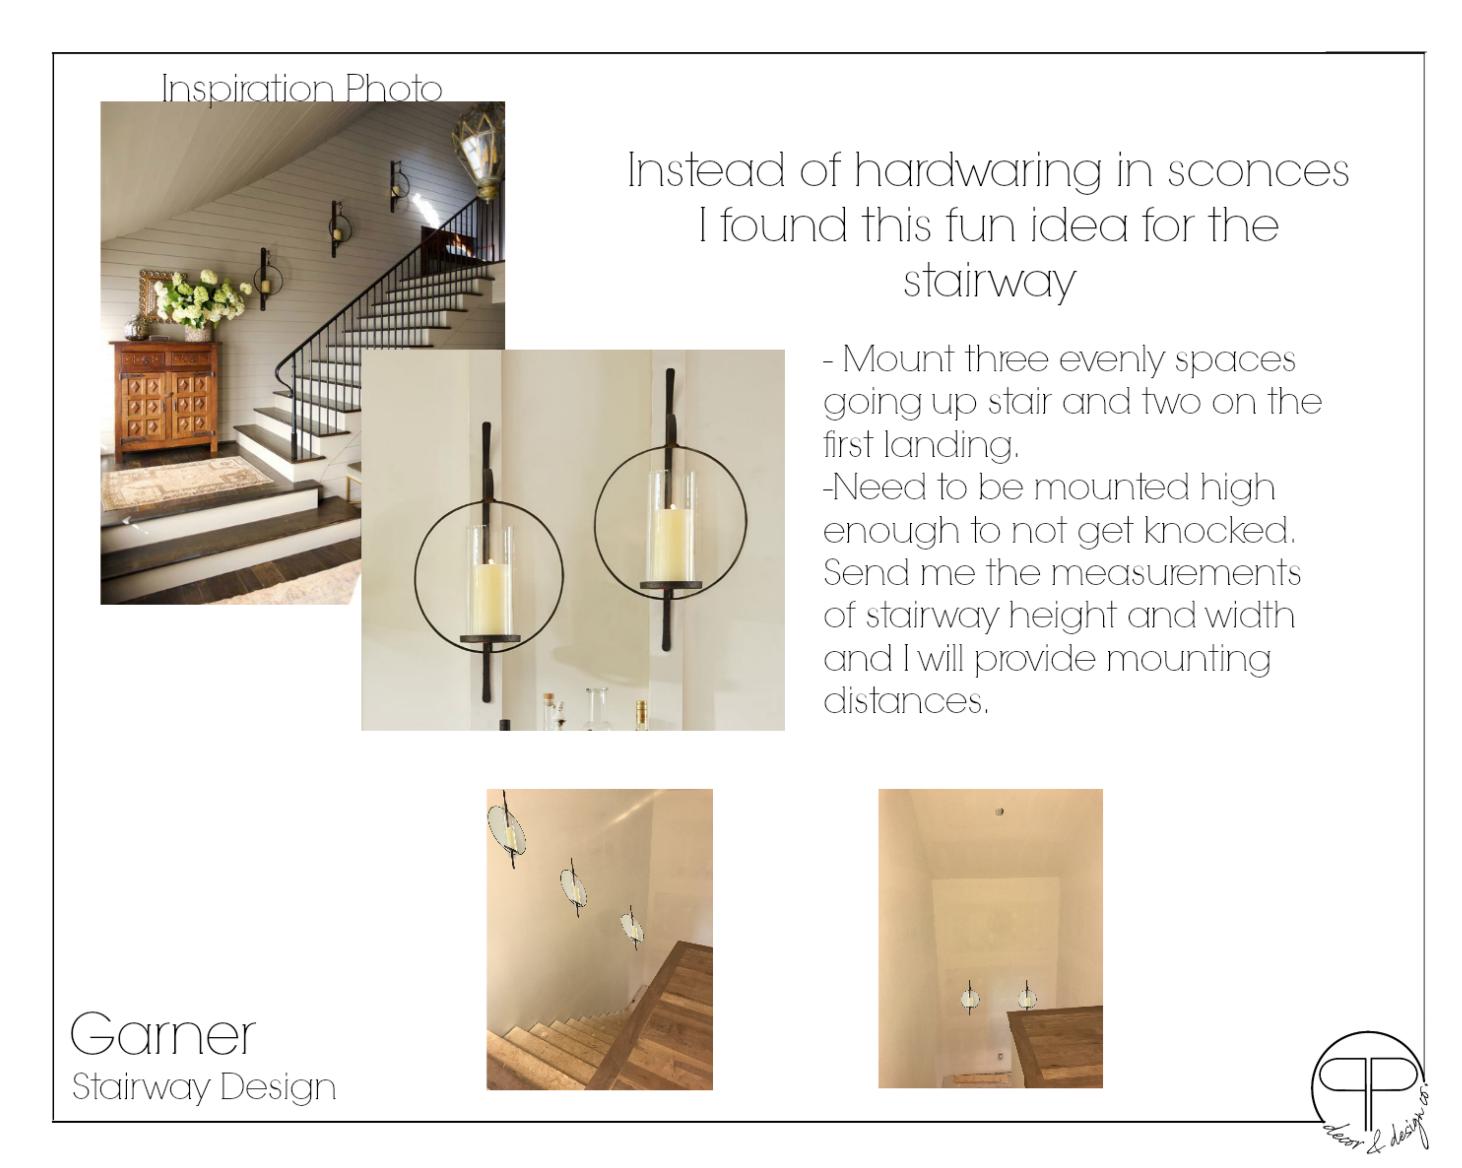 Garner_Stairway_Design.png